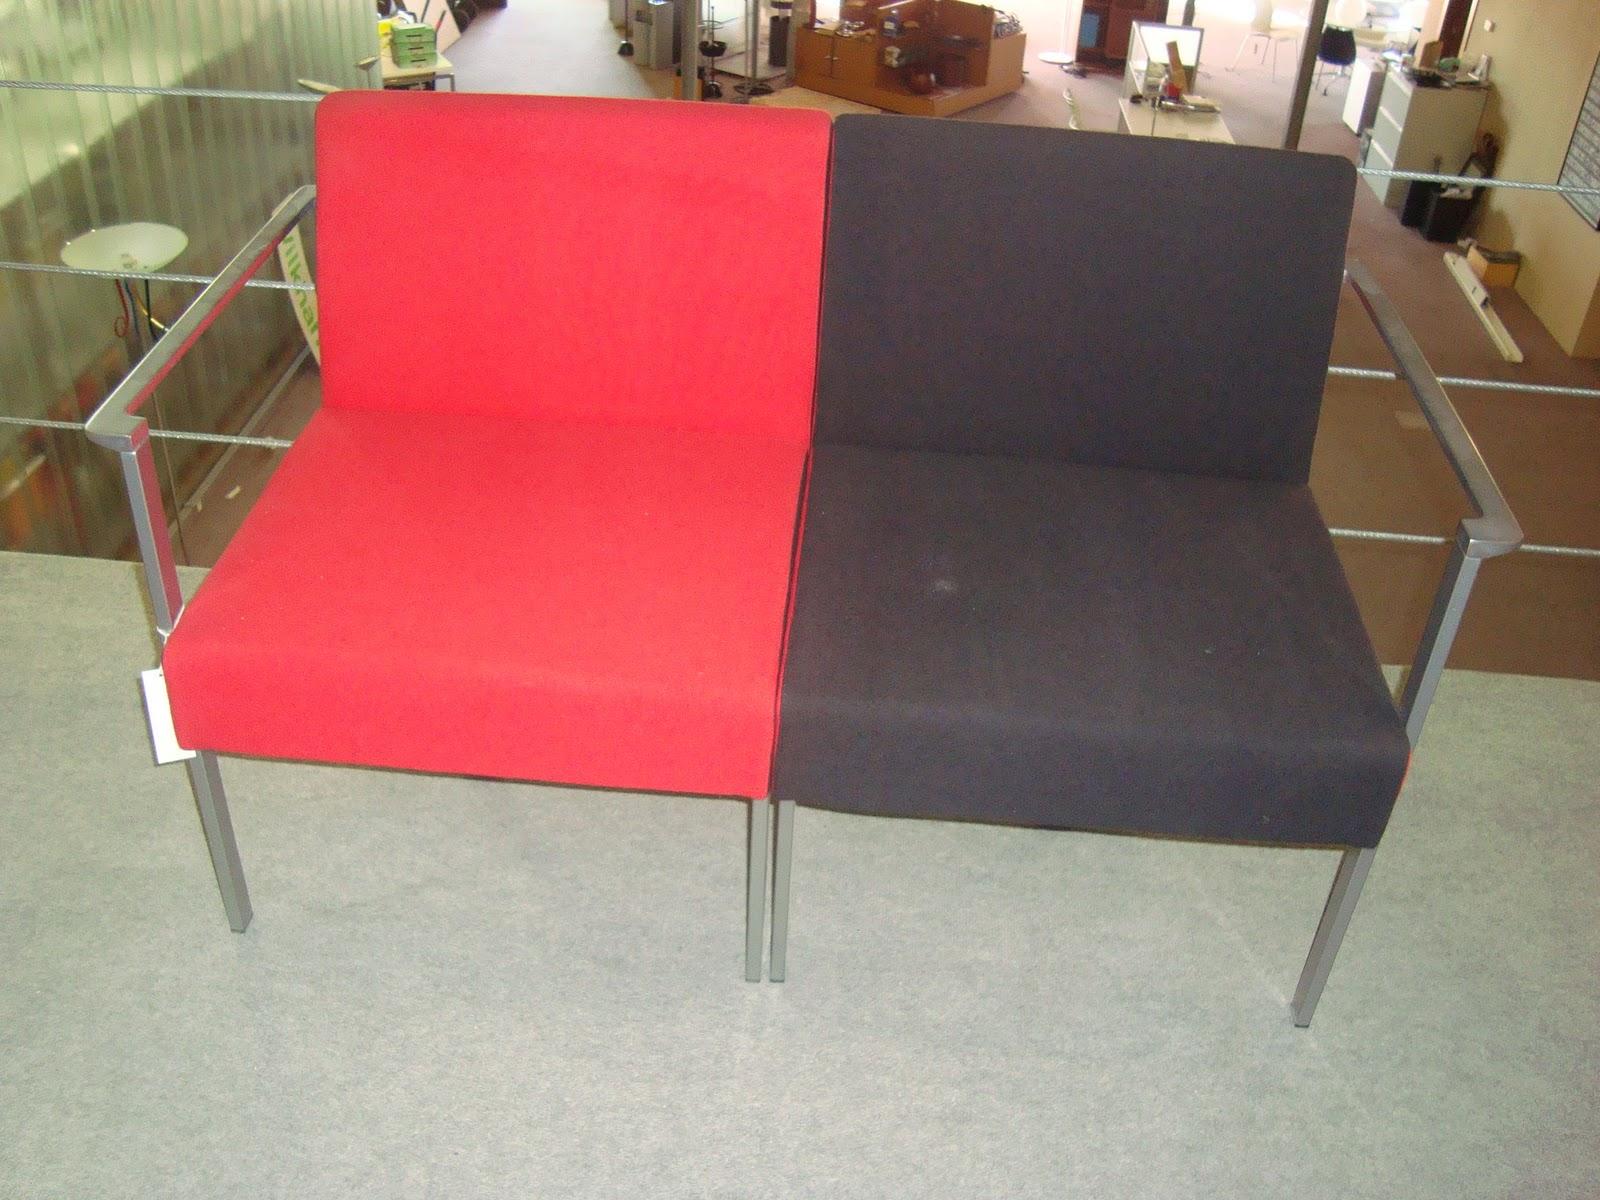 Liquidacion muebles de dise o zonas de espera for Liquidacion muebles diseno